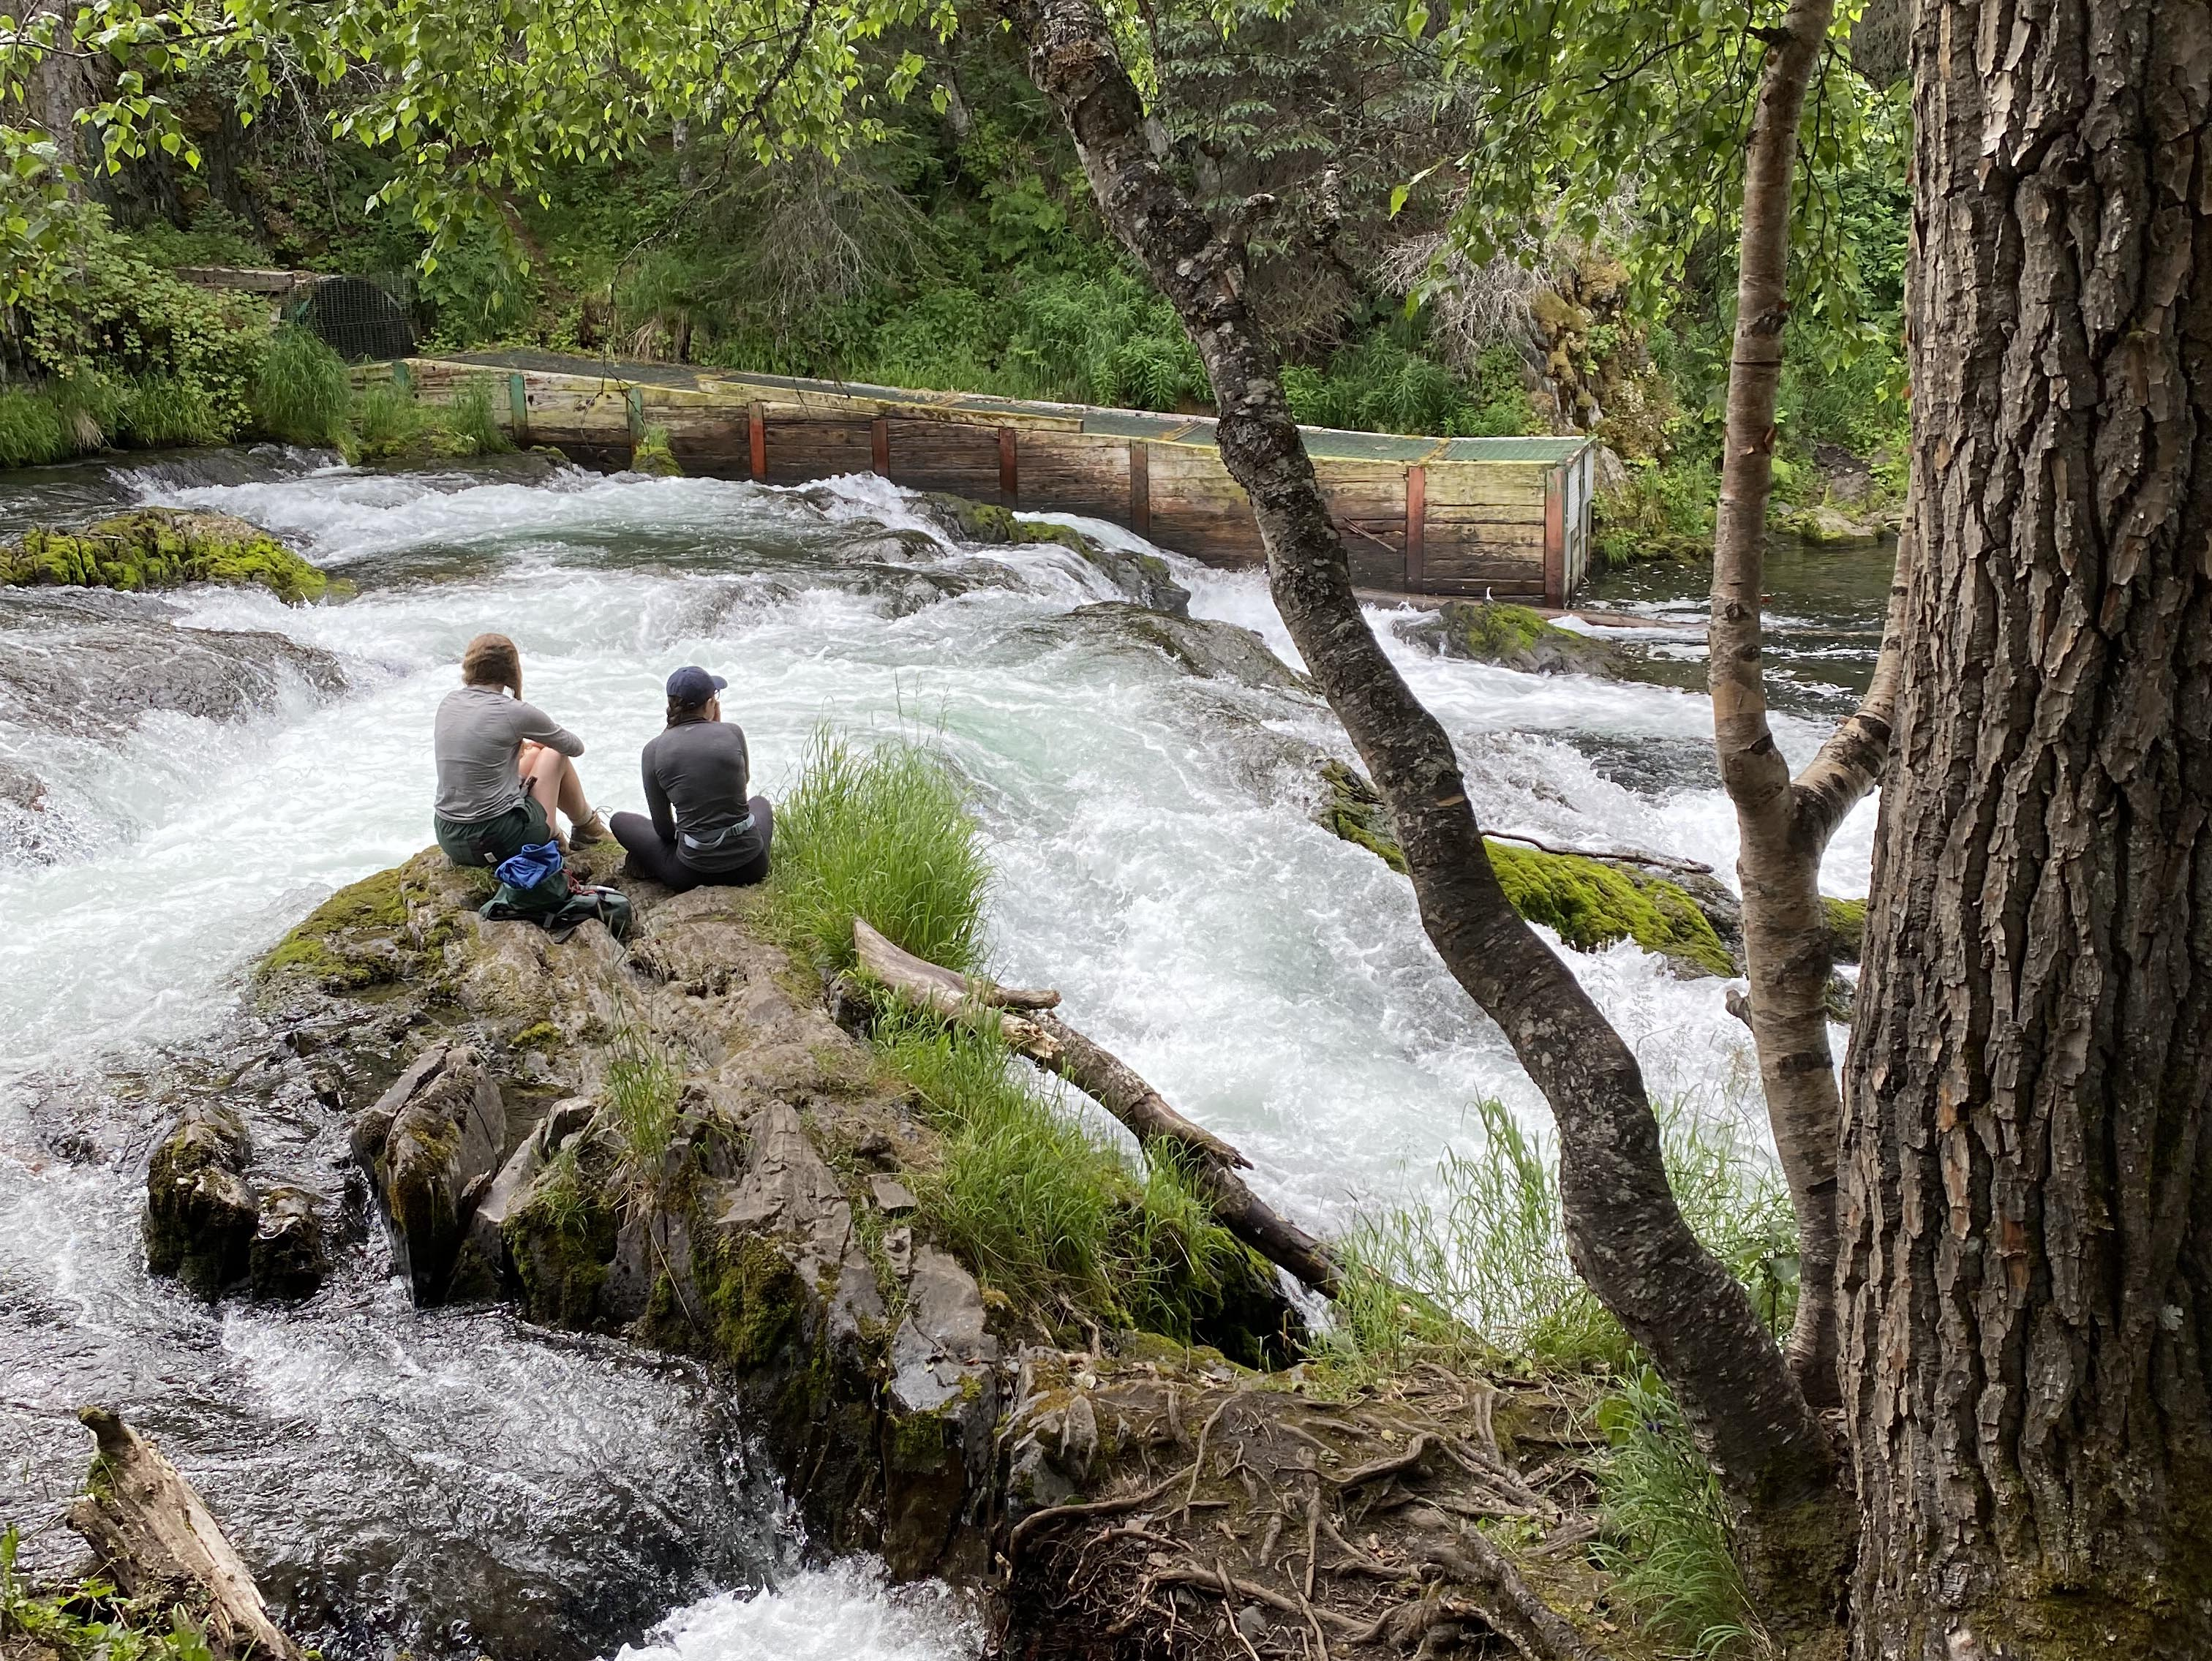 The destination of our off-piste hike near the Kenai Riverside Lodge